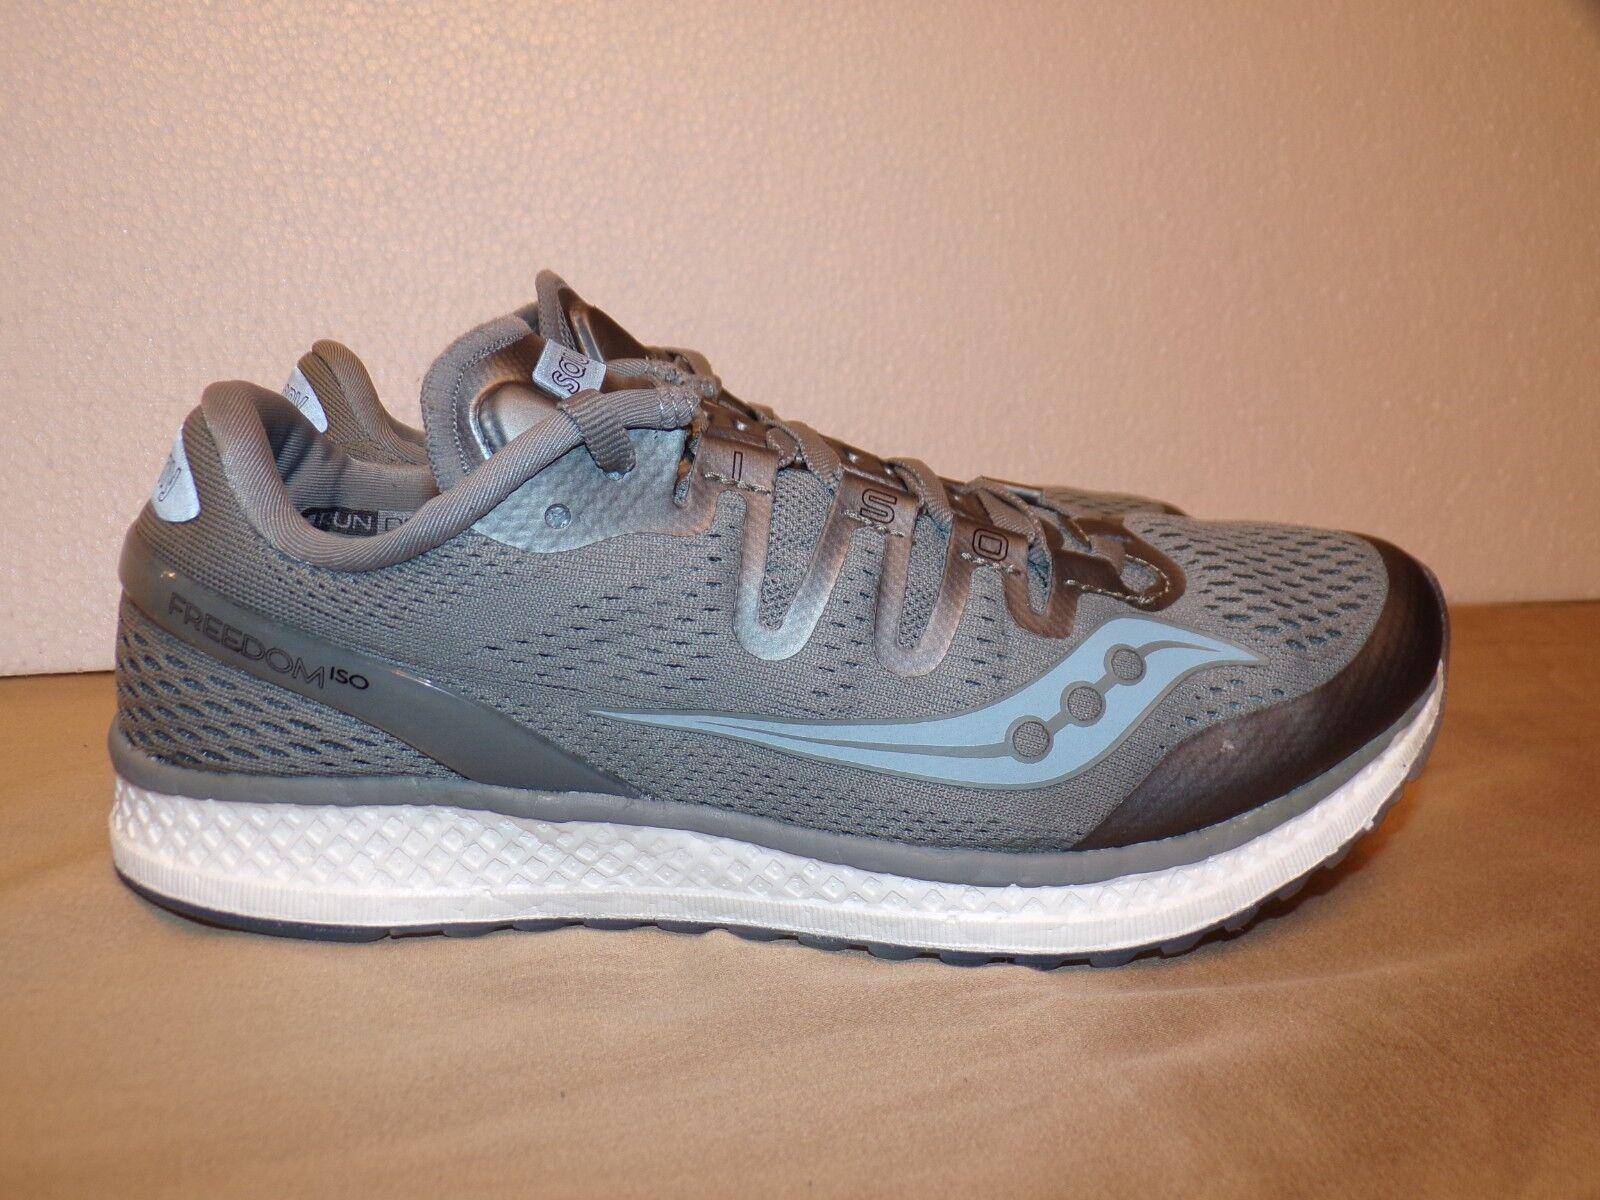 ISO Freedom Saucony Men's Running (S20355 51) Grey shoes